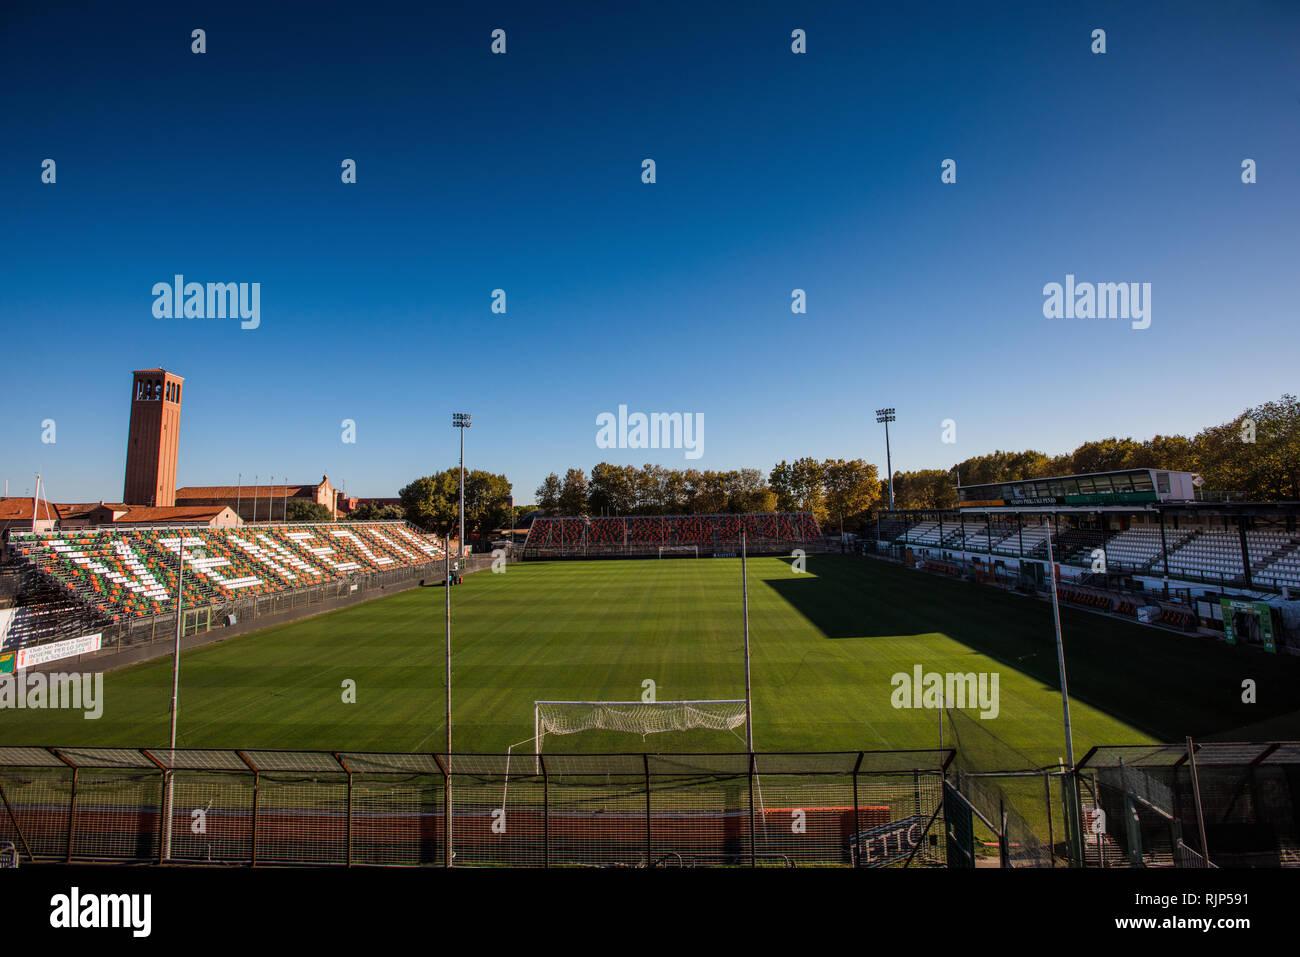 Stadio Pierluigi Penzo. Venezia Football Club S.r.l. - Stock Image